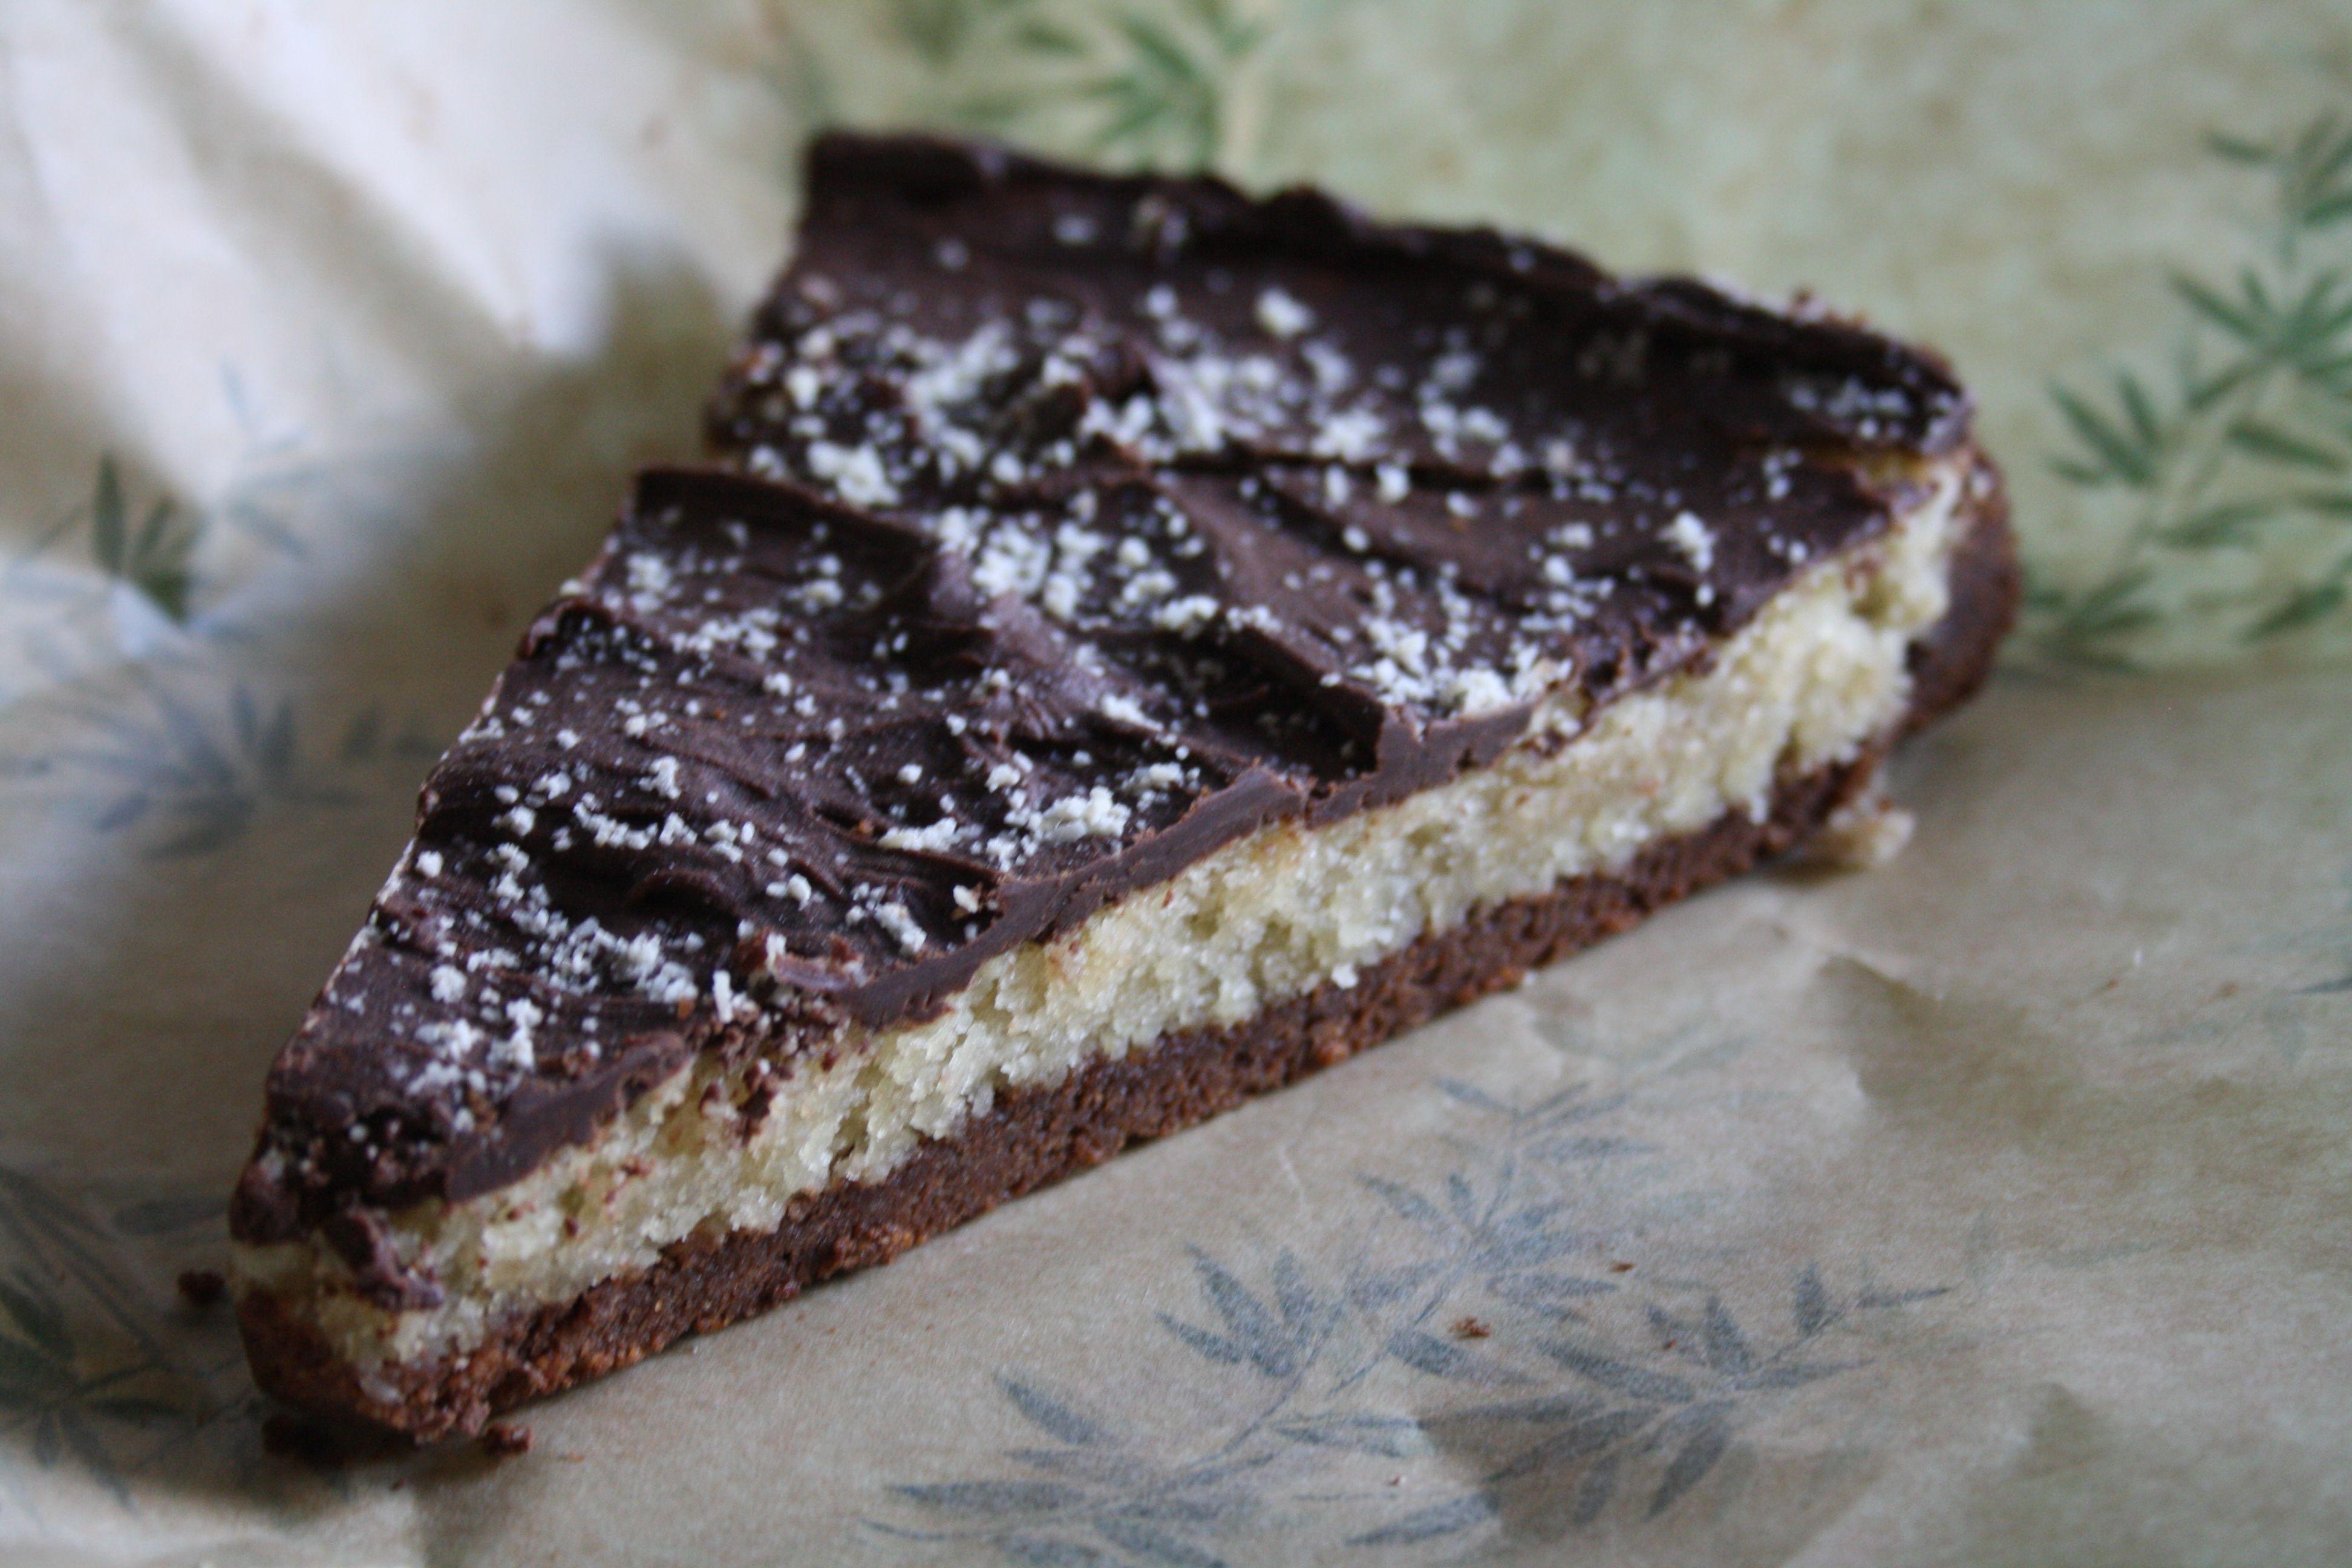 #vegan #almond #chocolate à Greedy Guts - Caen - restaurant végétar/lien